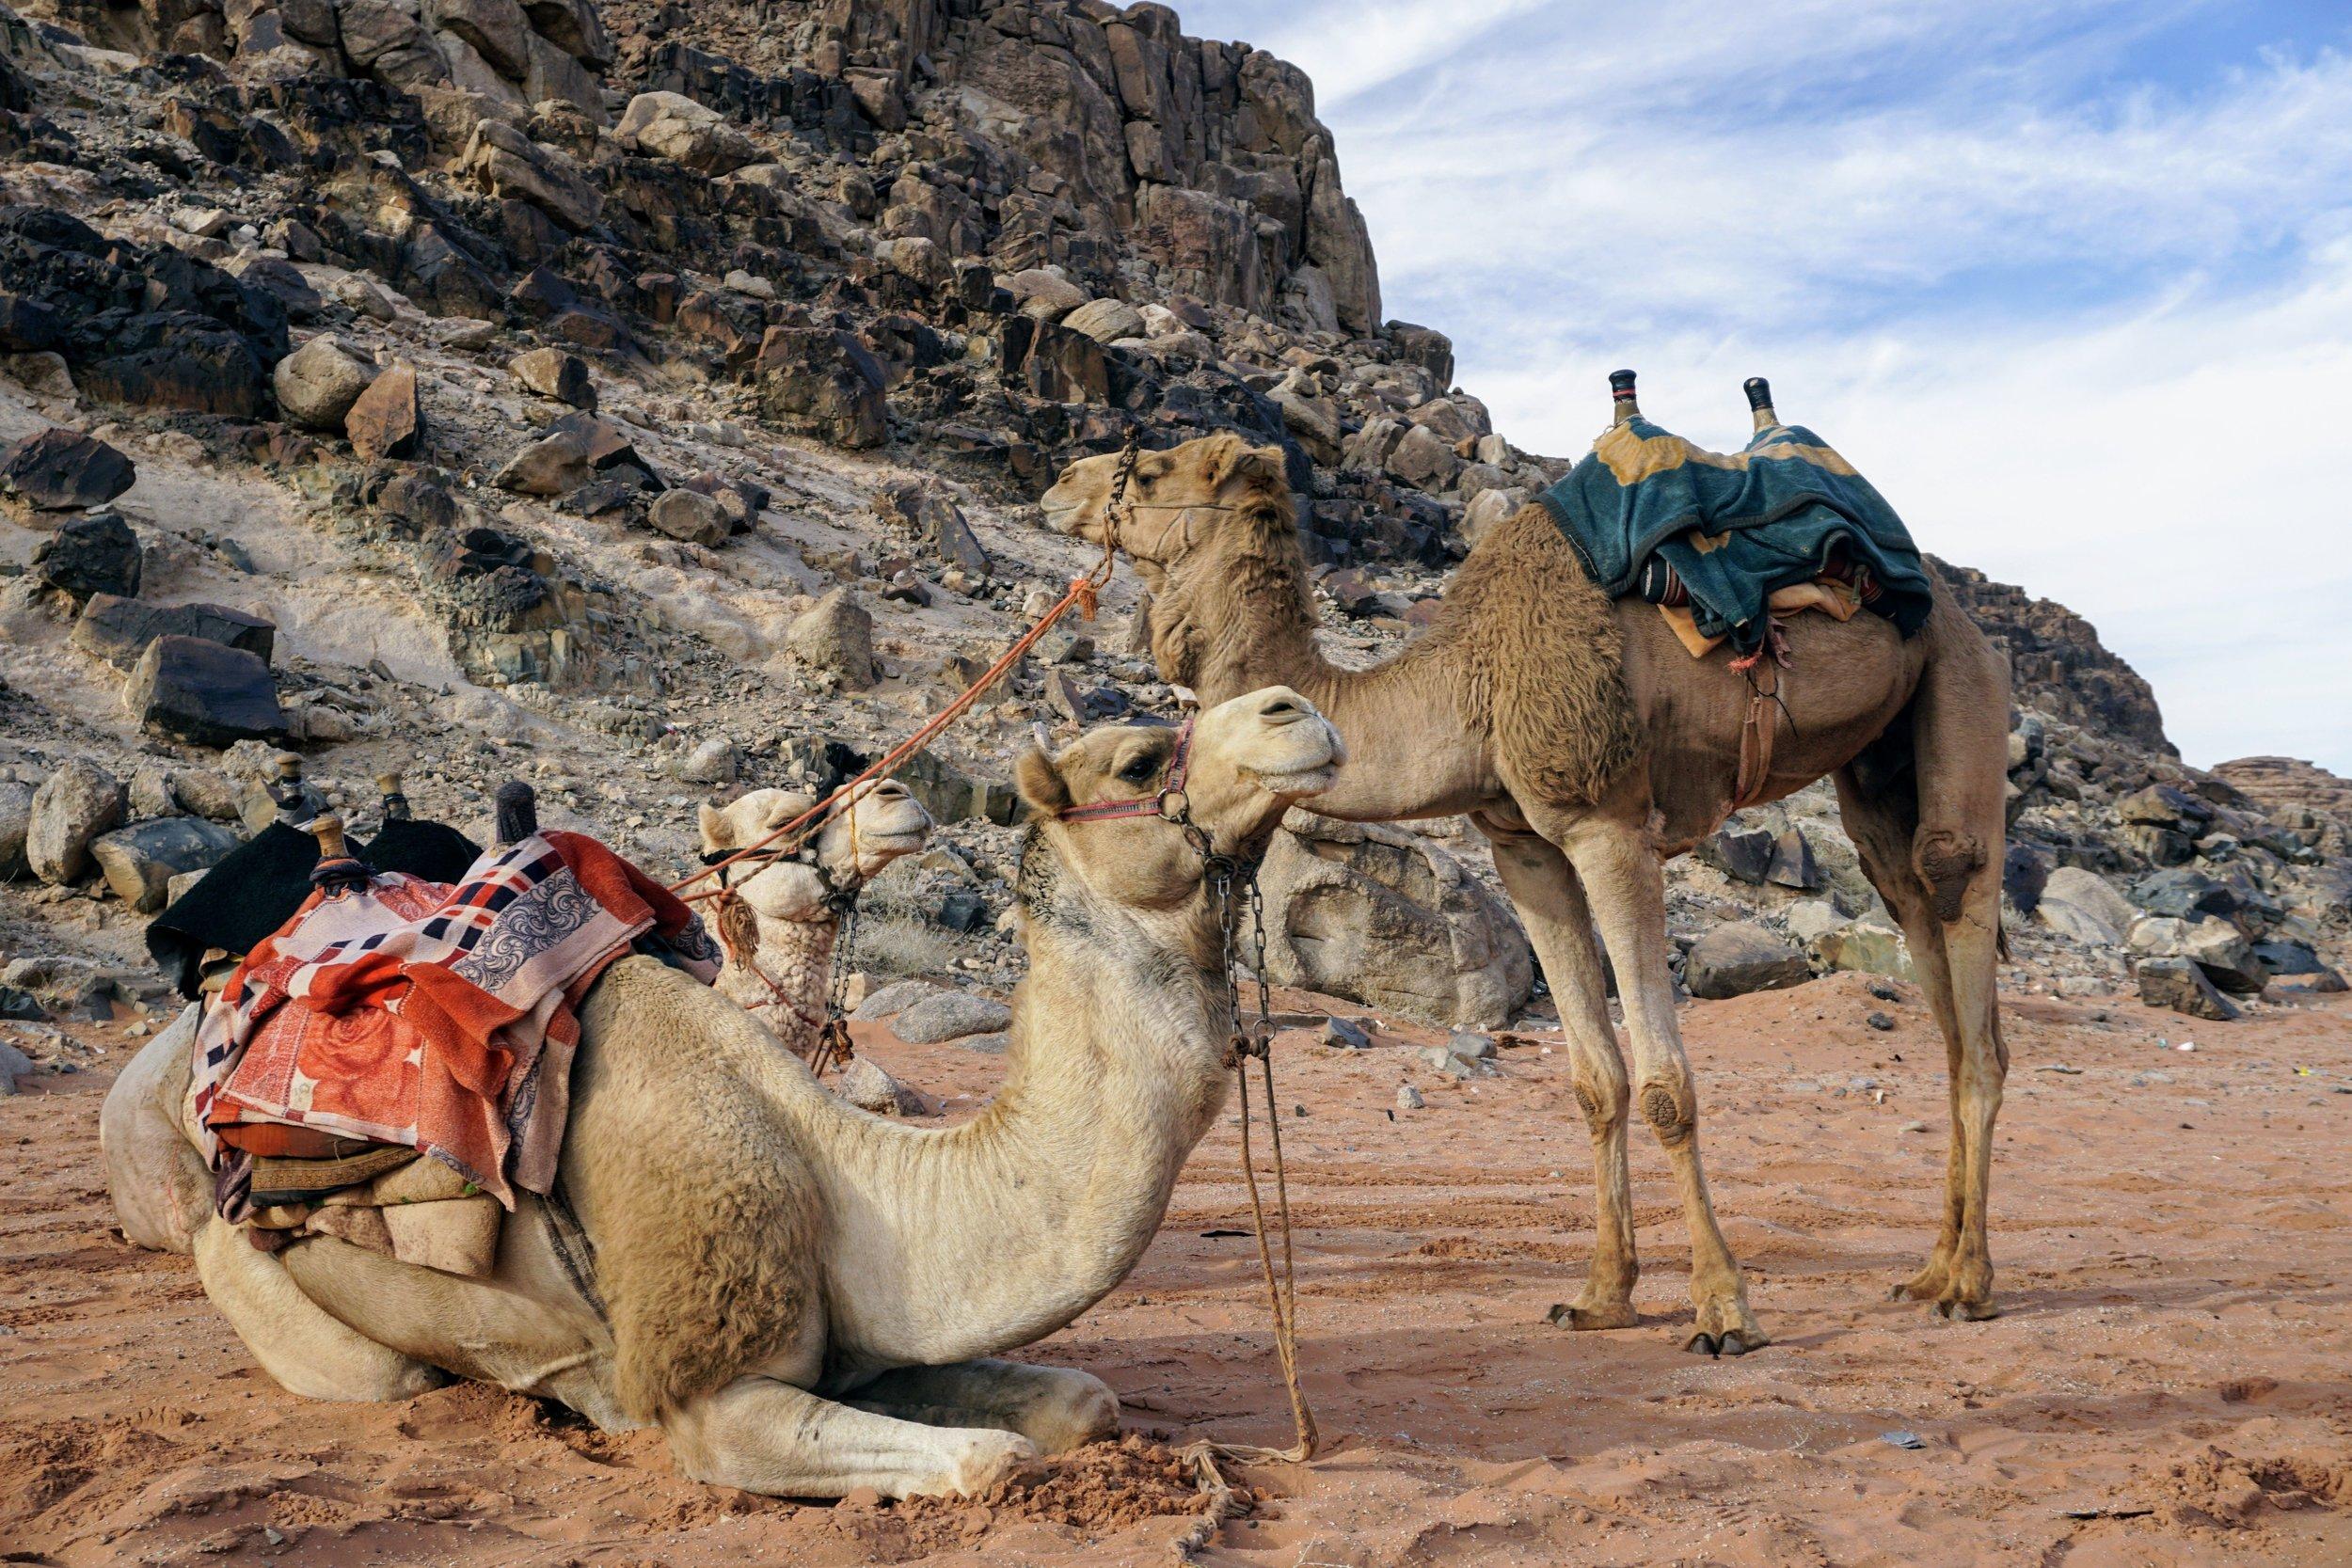 Camel Riding in the Wadi Rum Desert, Jordan